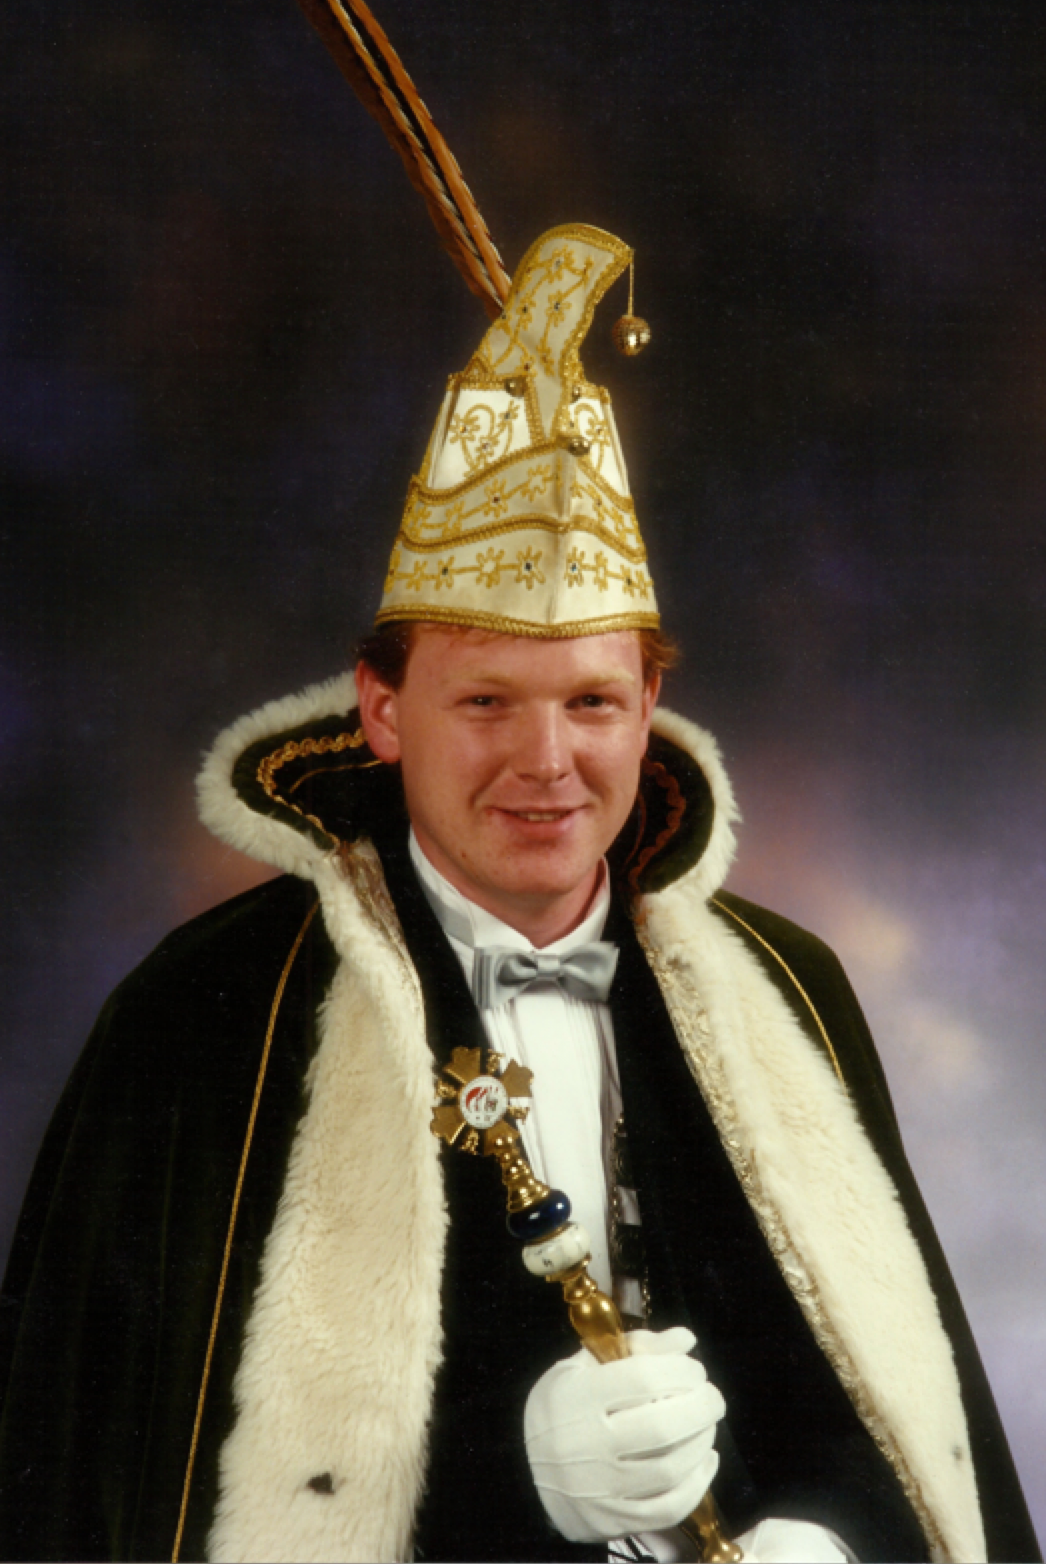 10. Maurice I Heynen Seizoen 1992